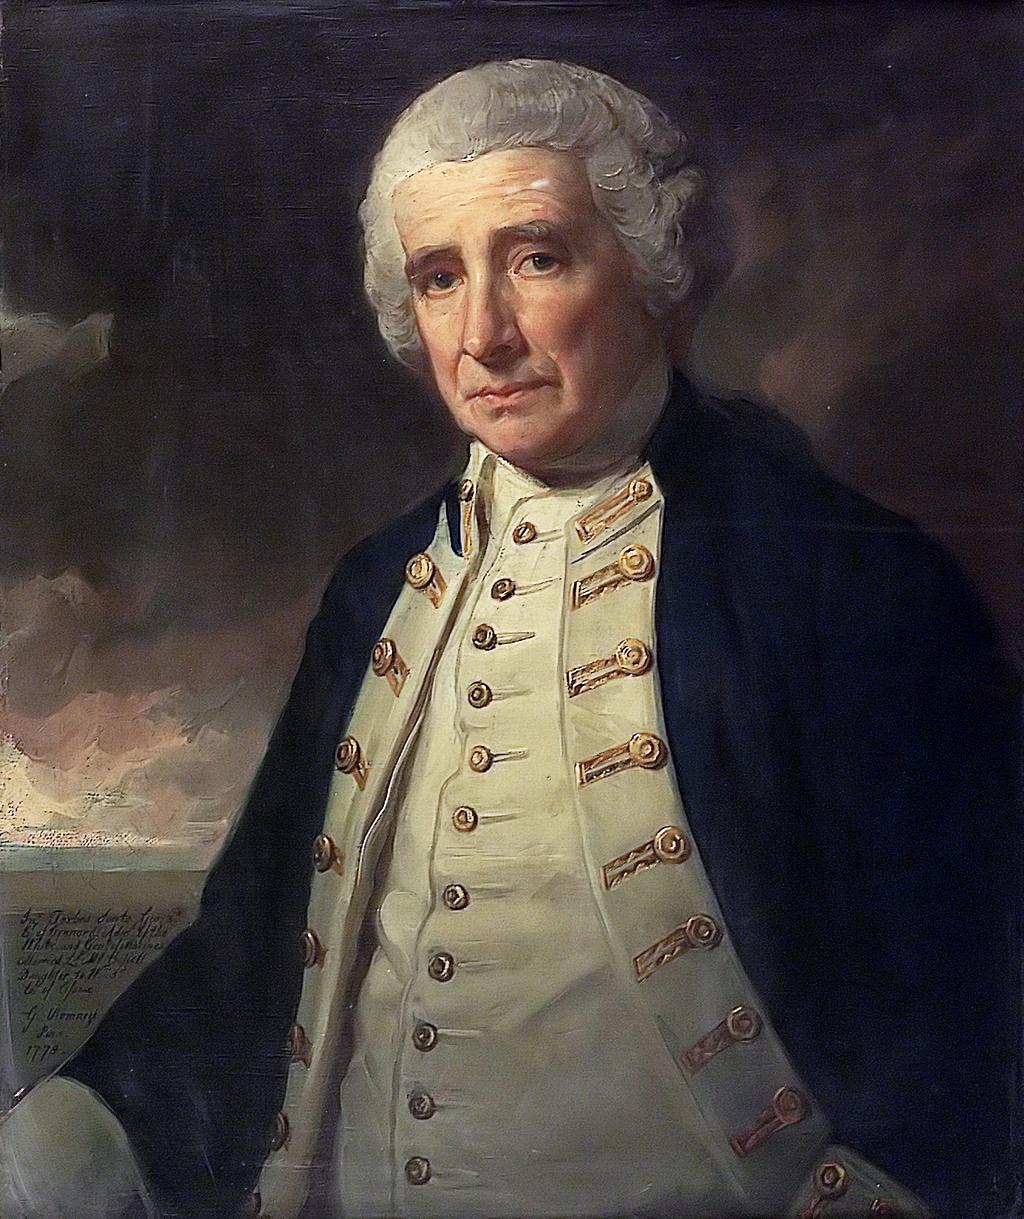 John Forbes mathematician